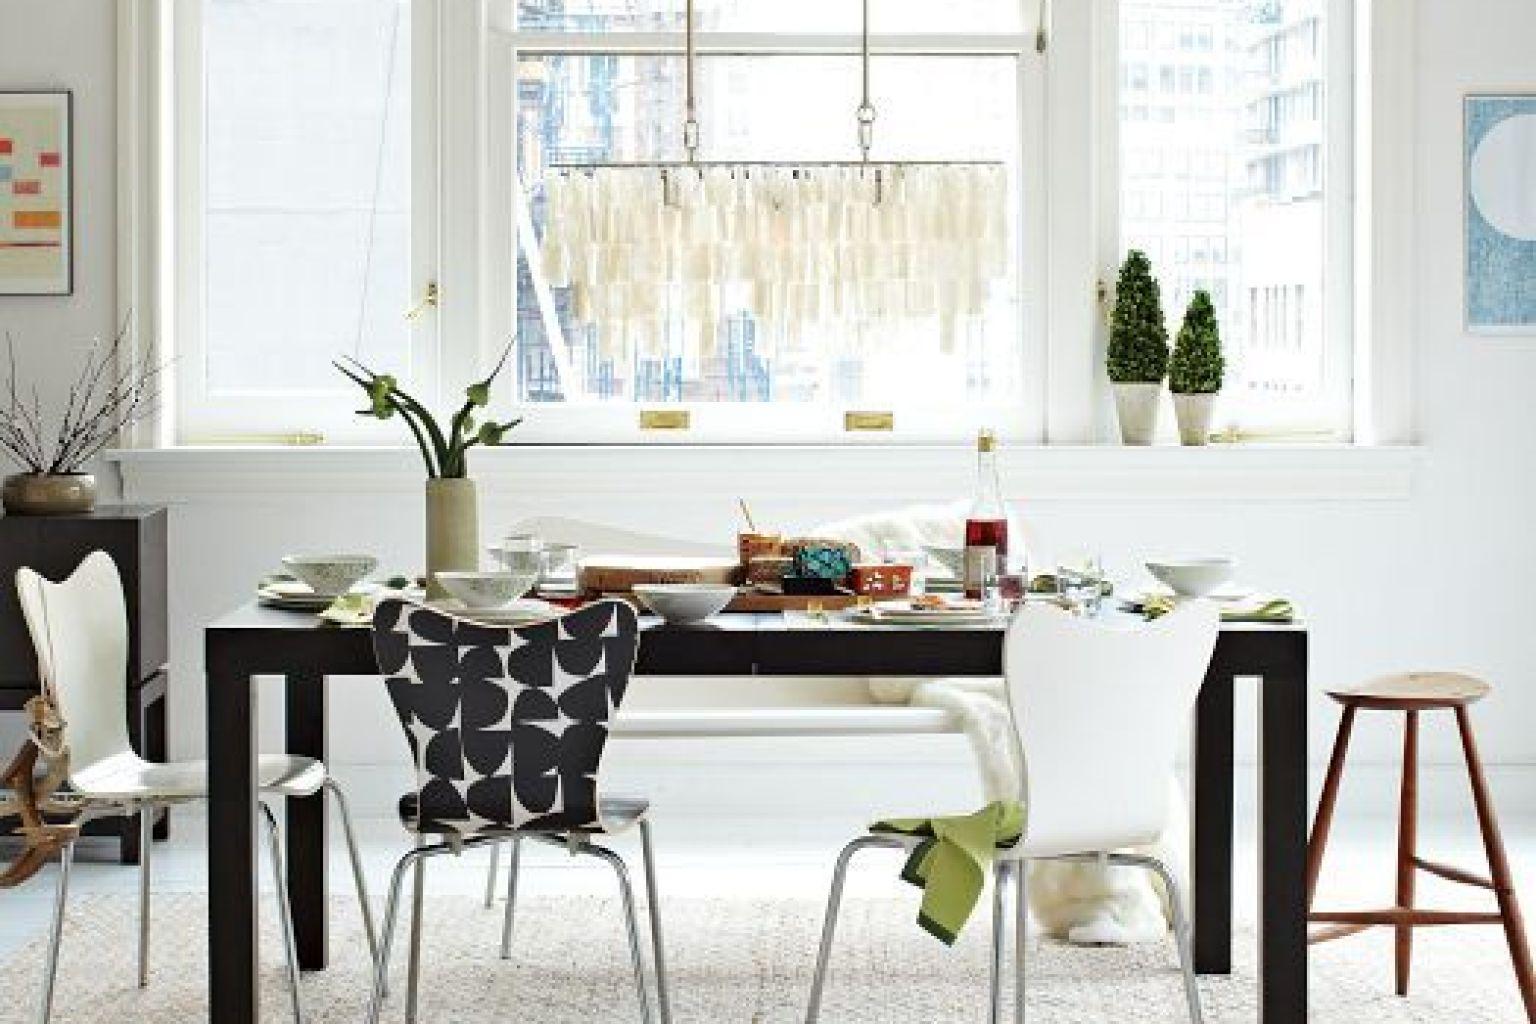 pictures of dining rooms. Pictures Of Dining Rooms